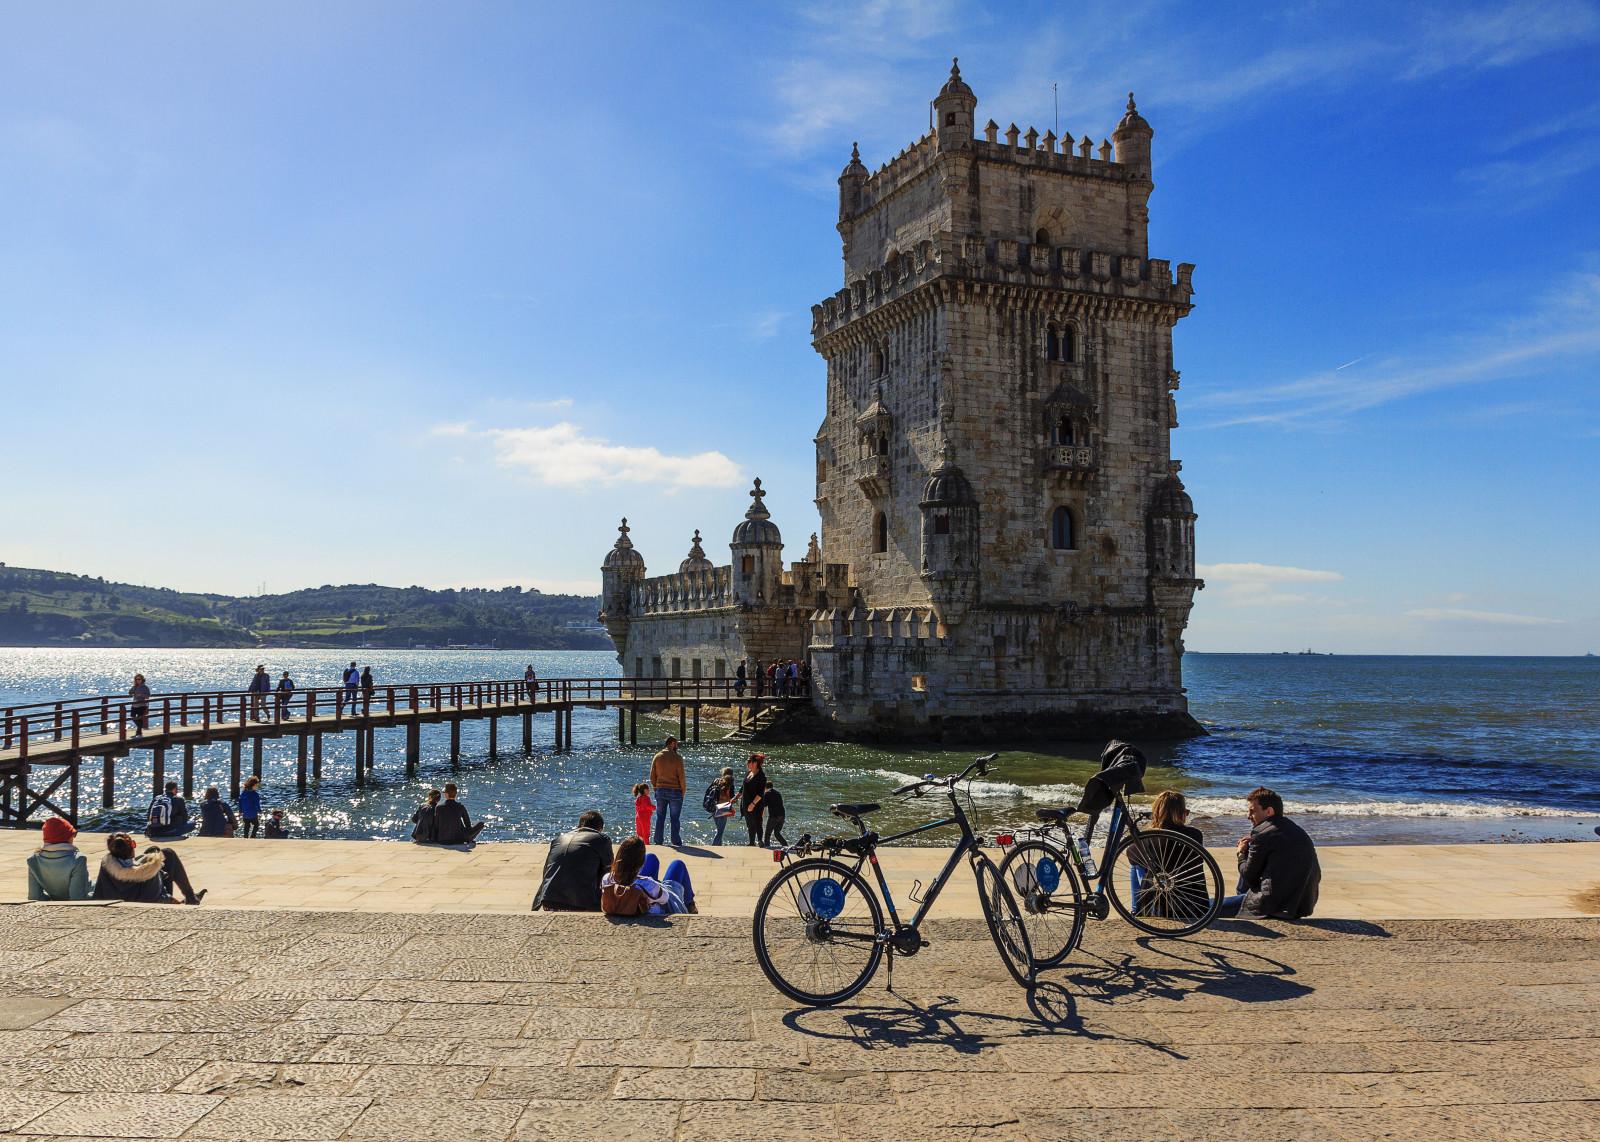 День ангела, архитектура лиссабона картинки